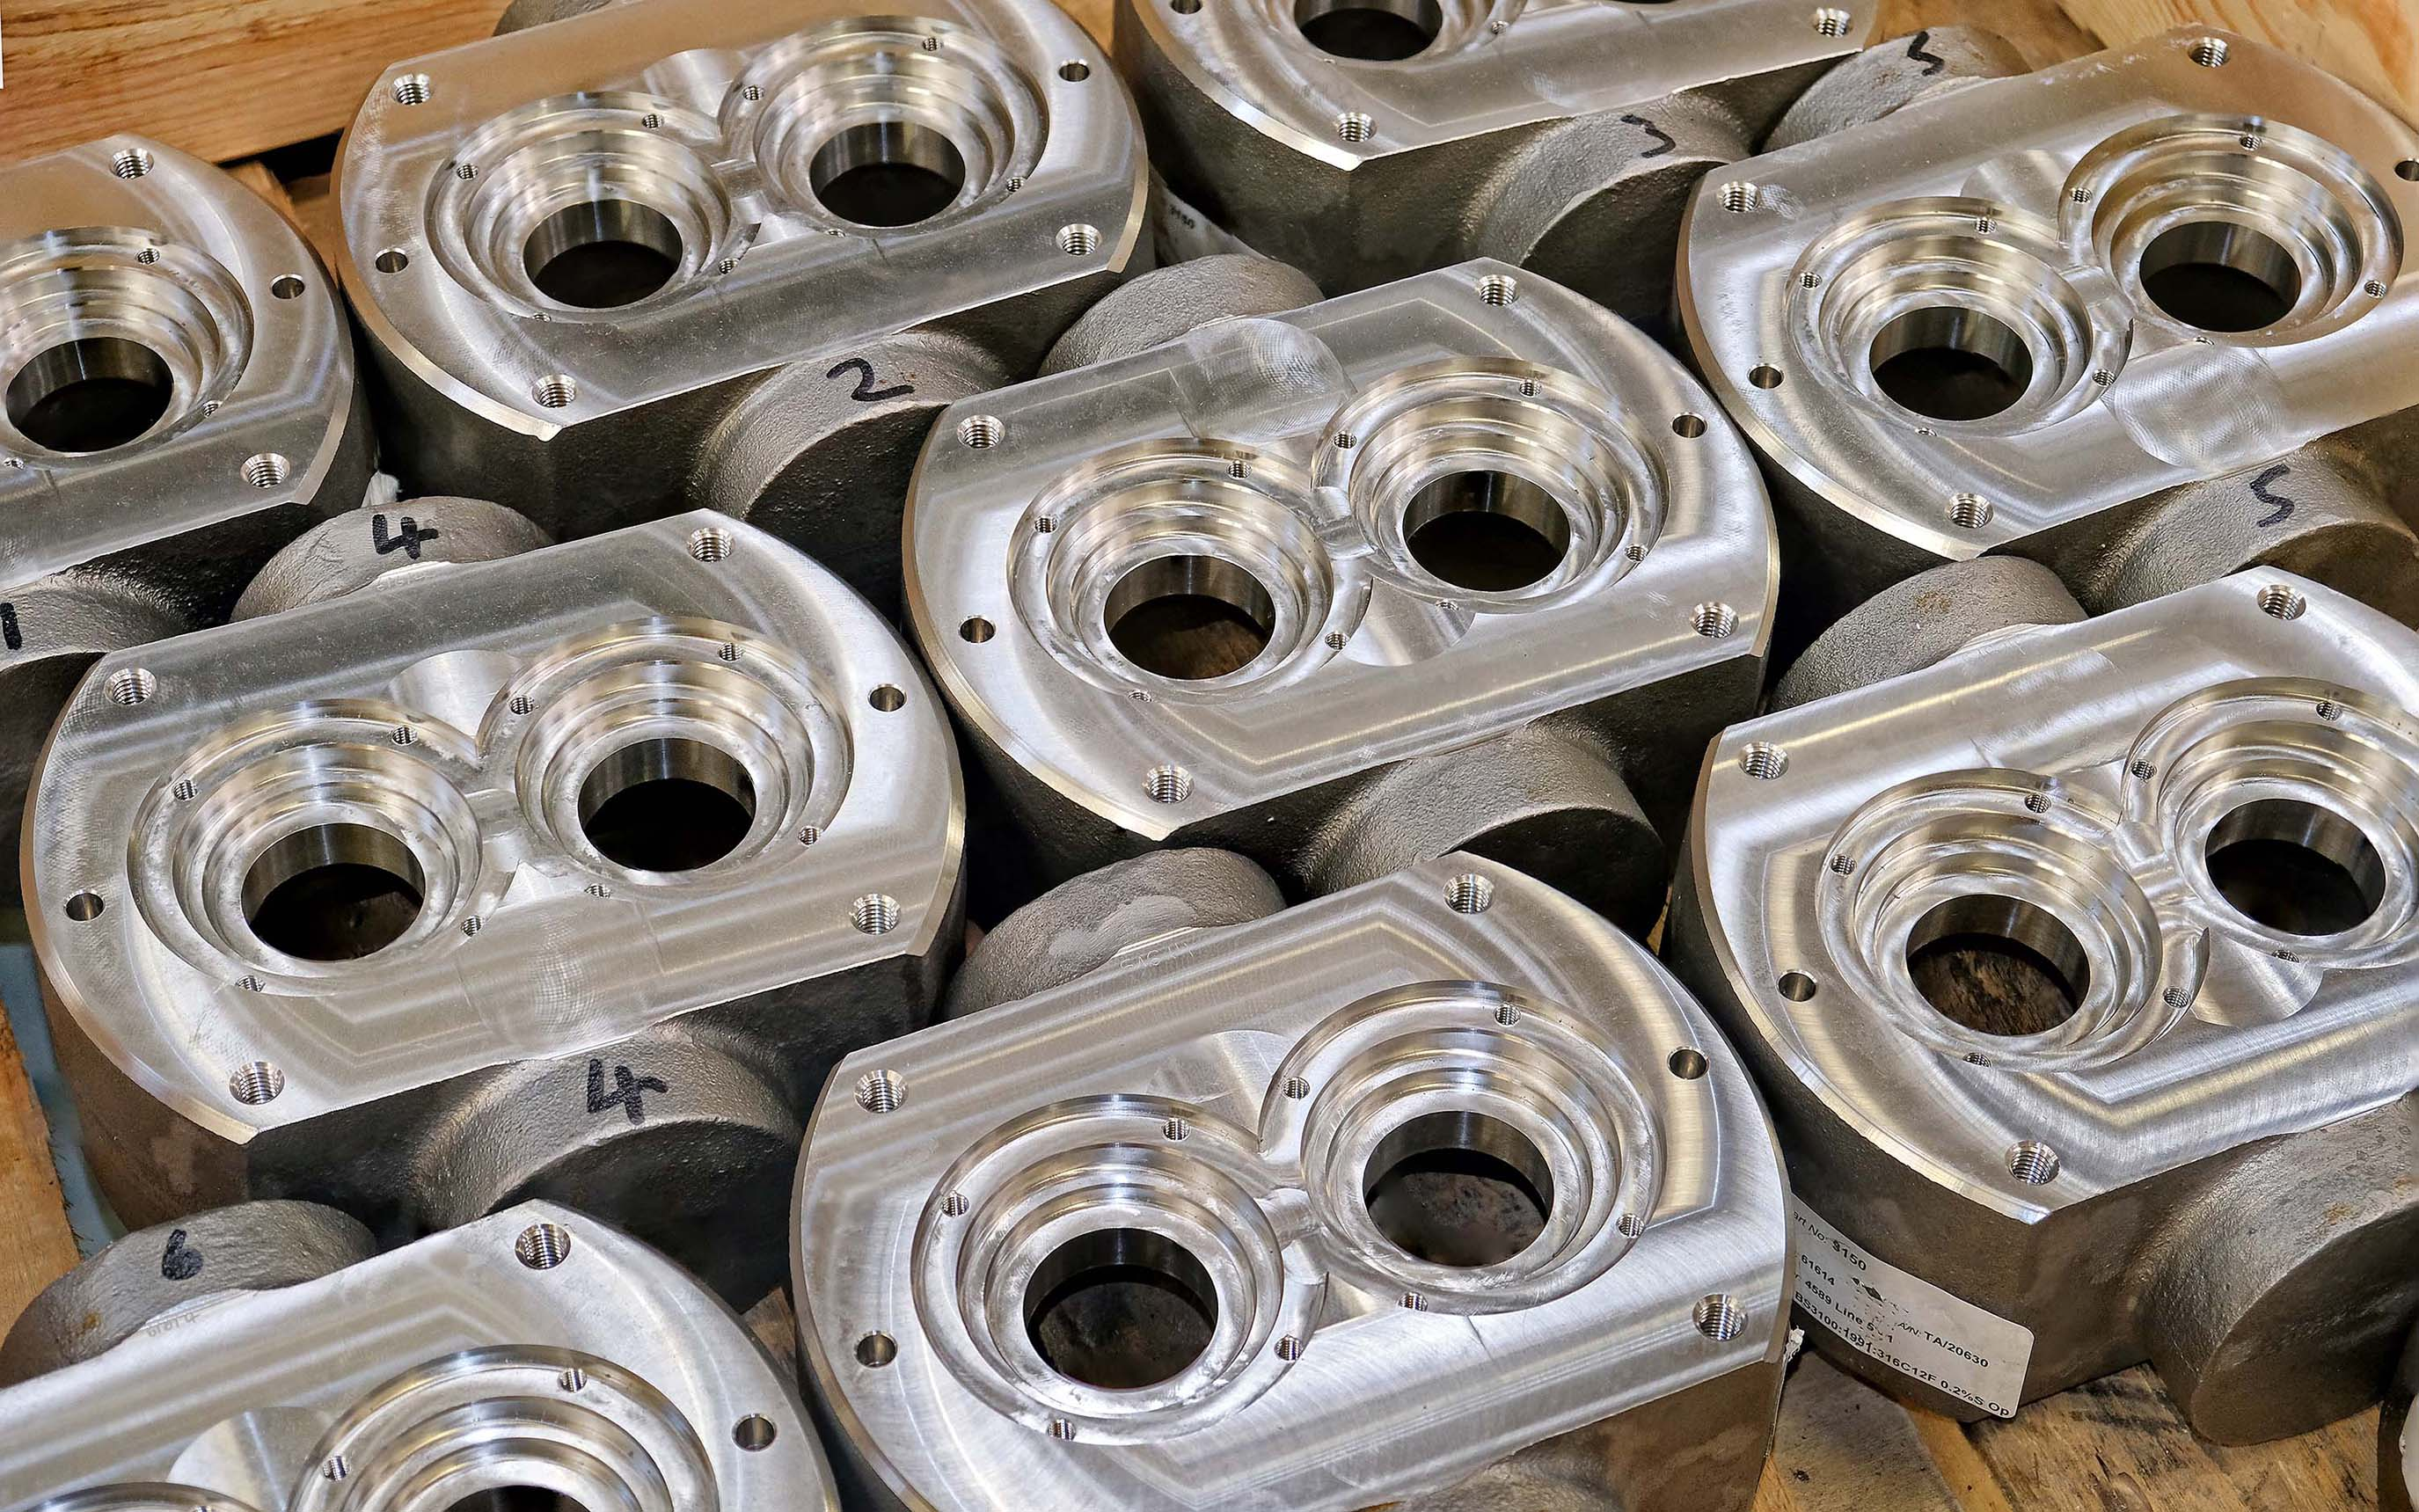 atc components machining